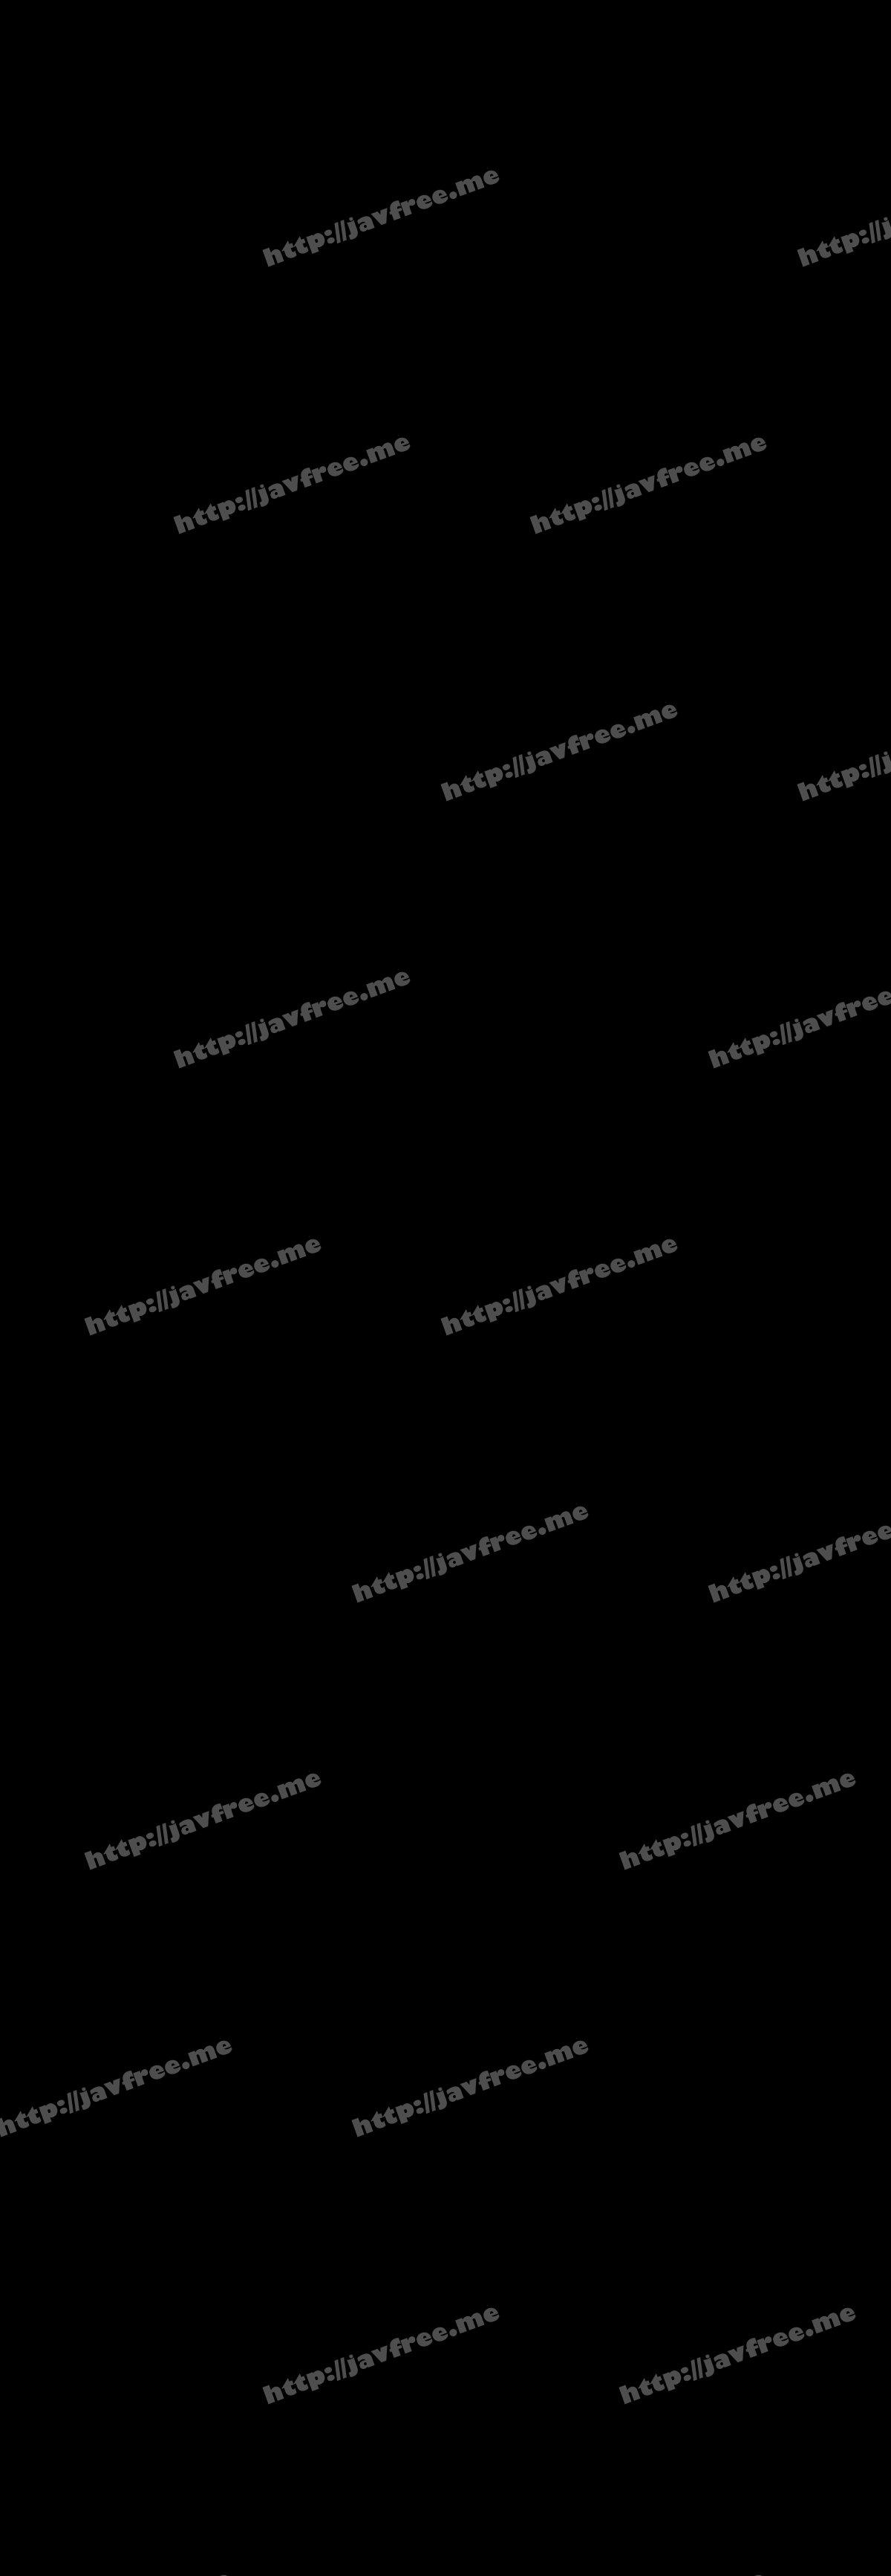 [HD][JRZD-892] 初撮り人妻ドキュメント 古田ゆり - image JRZD-892-720p on https://javfree.me